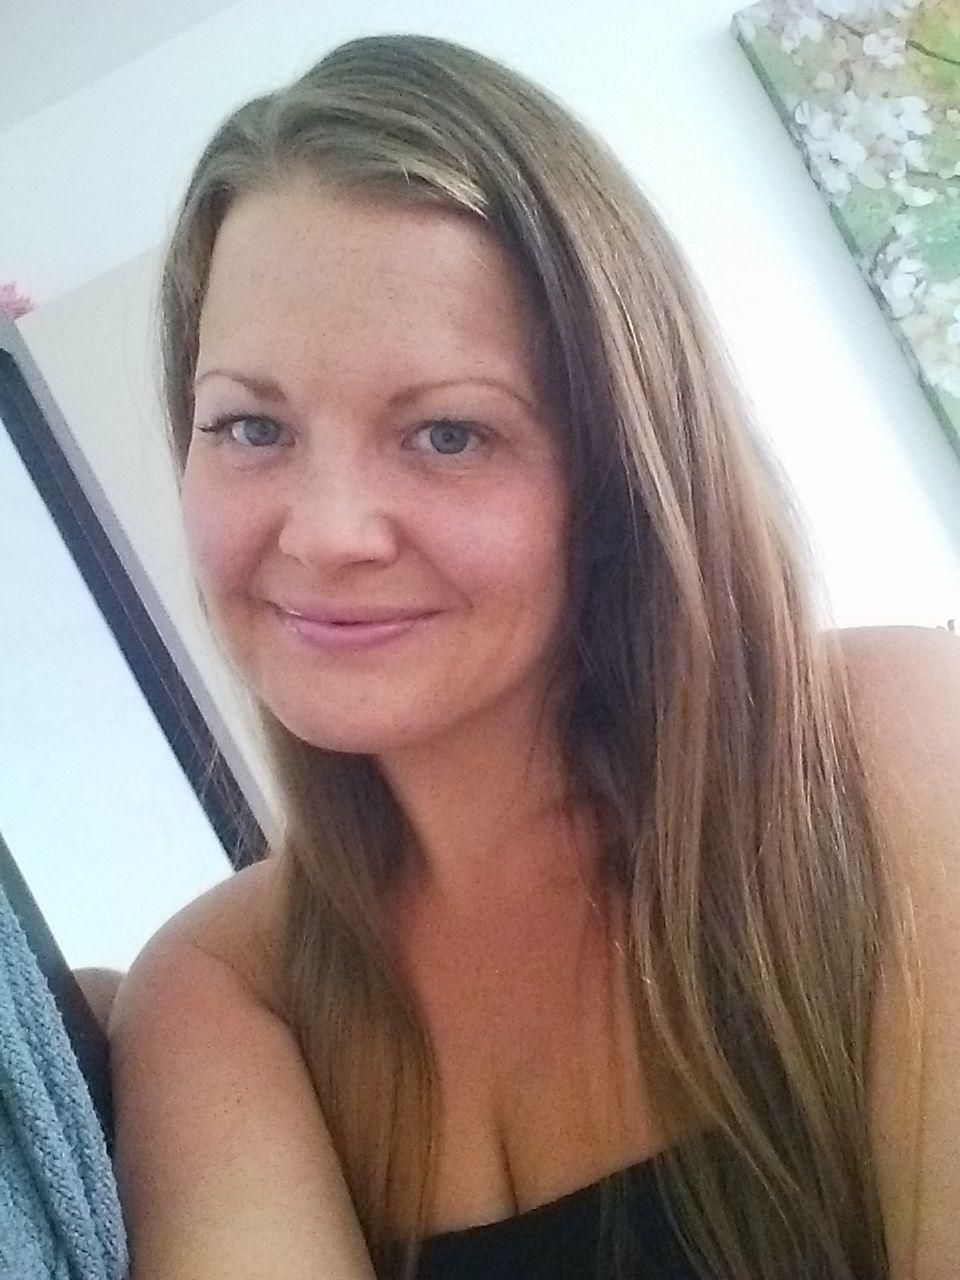 Uppsala escorts gratis dating site